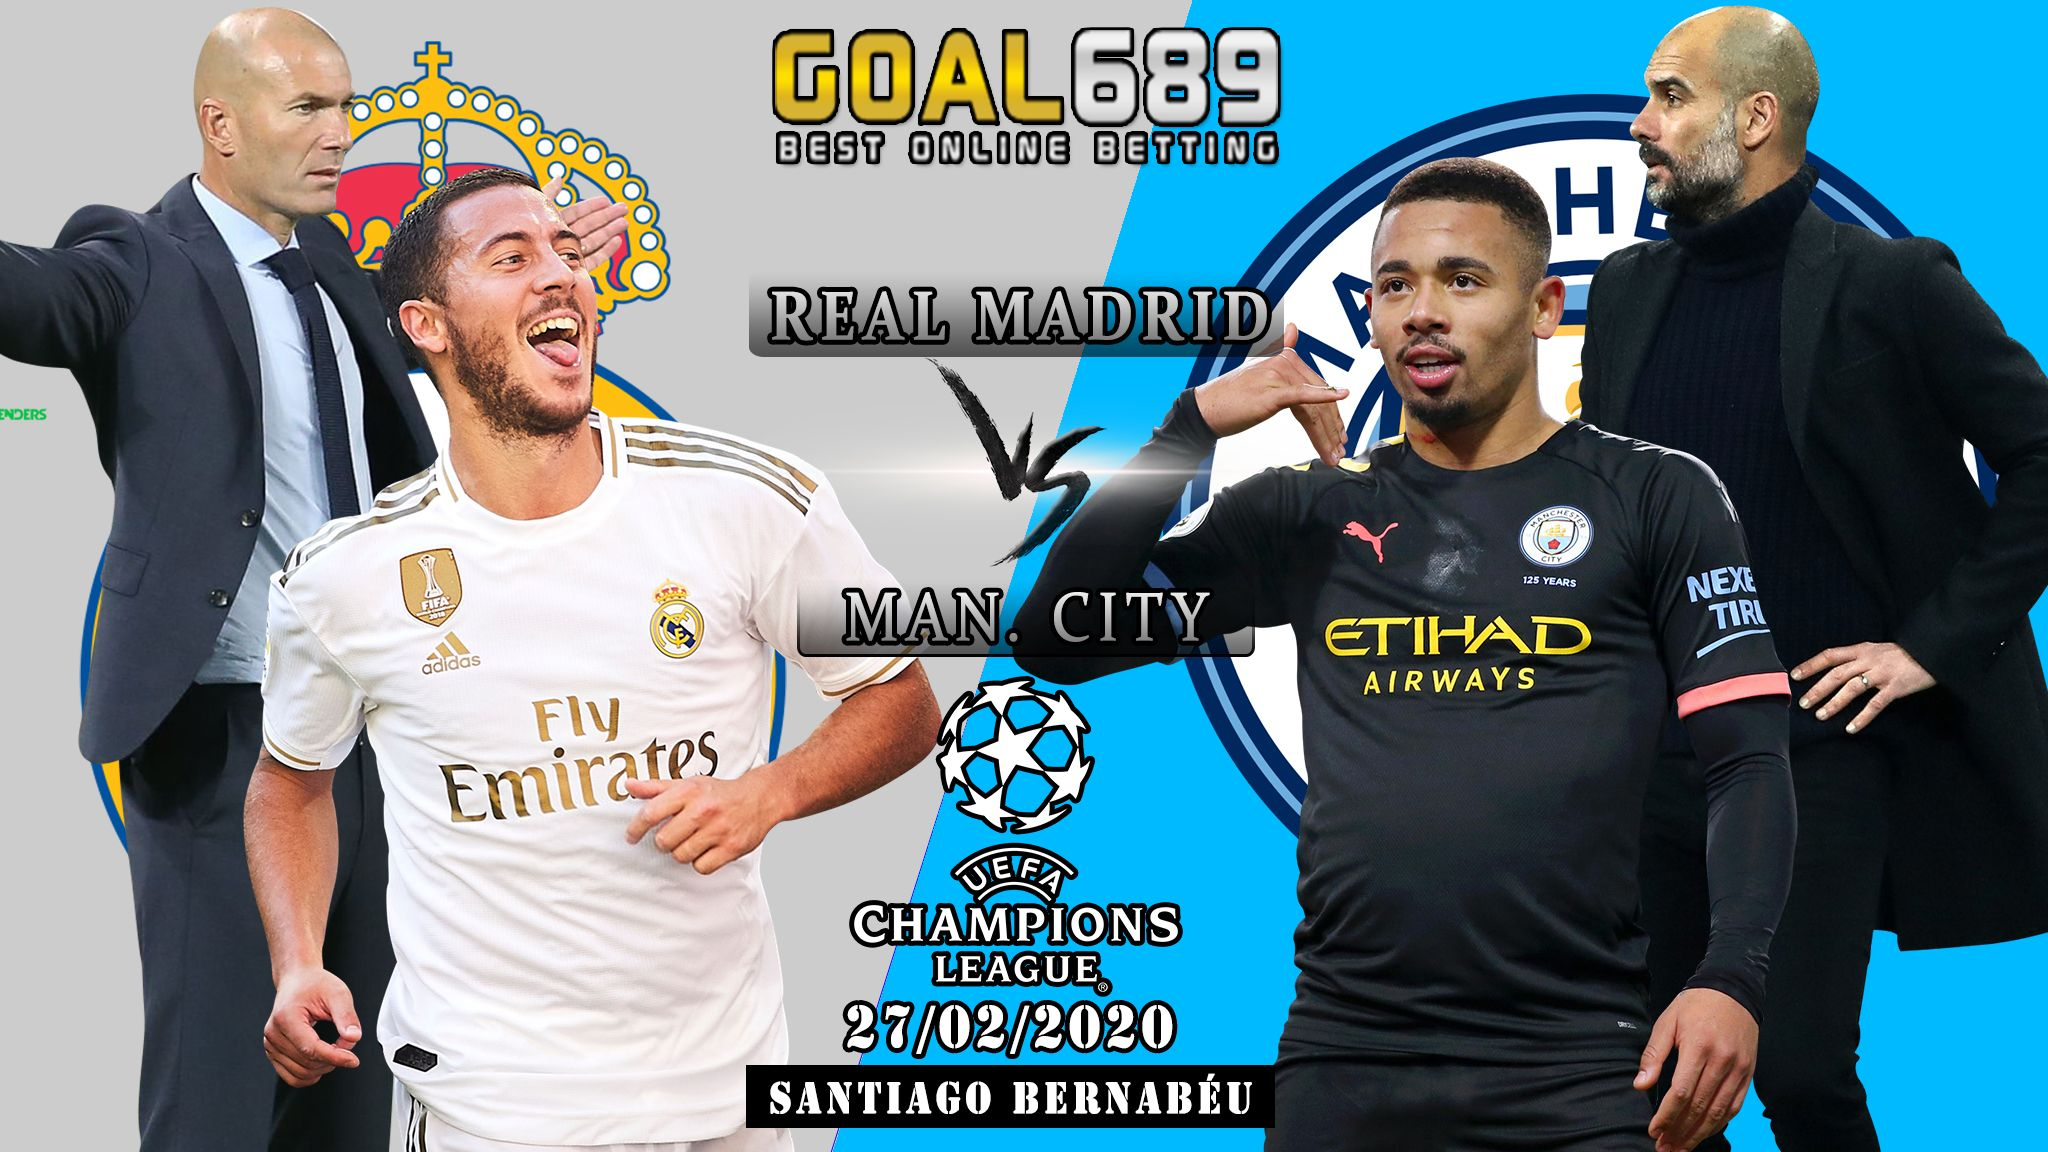 Prediksi Real Madrid Vs Manchester City 27 Februari 2020 Agenbola Agenbolaterpercaya Prediksibola Goal689 Agenbandarq In 2020 Real Madrid Manchester City Madrid